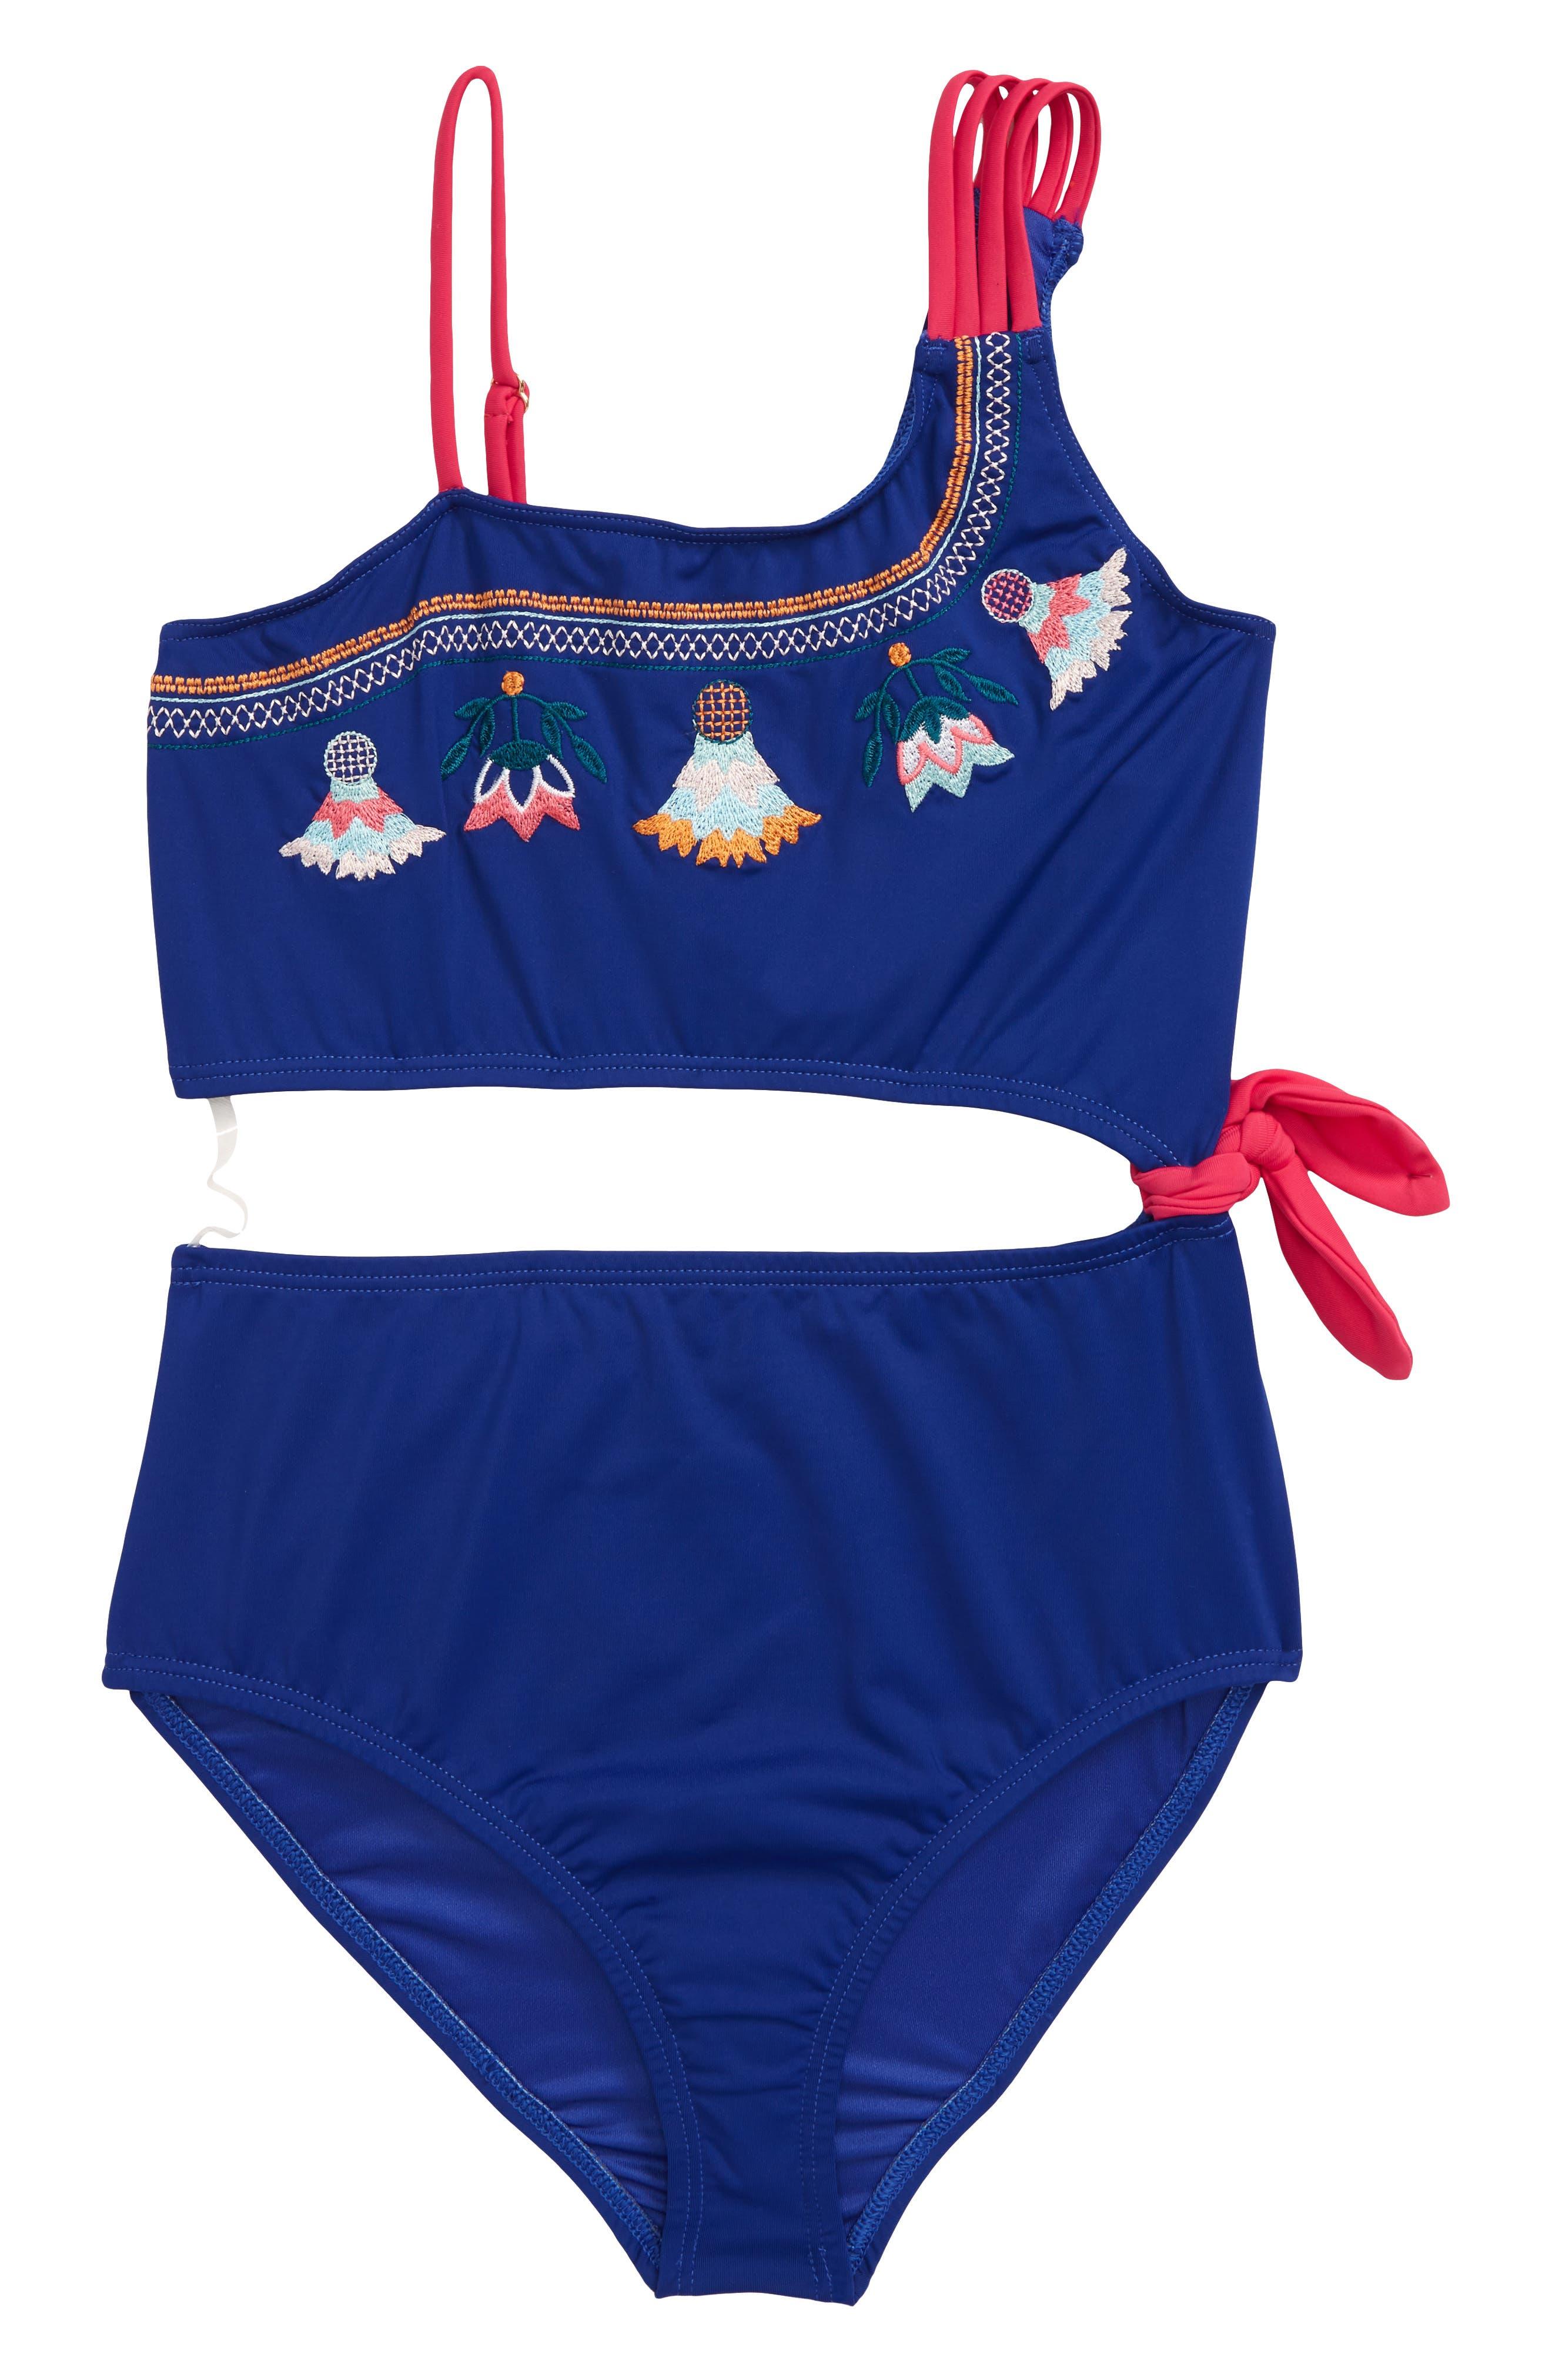 Girls Heart And Harmony Embroidered Monokini Swimsuit